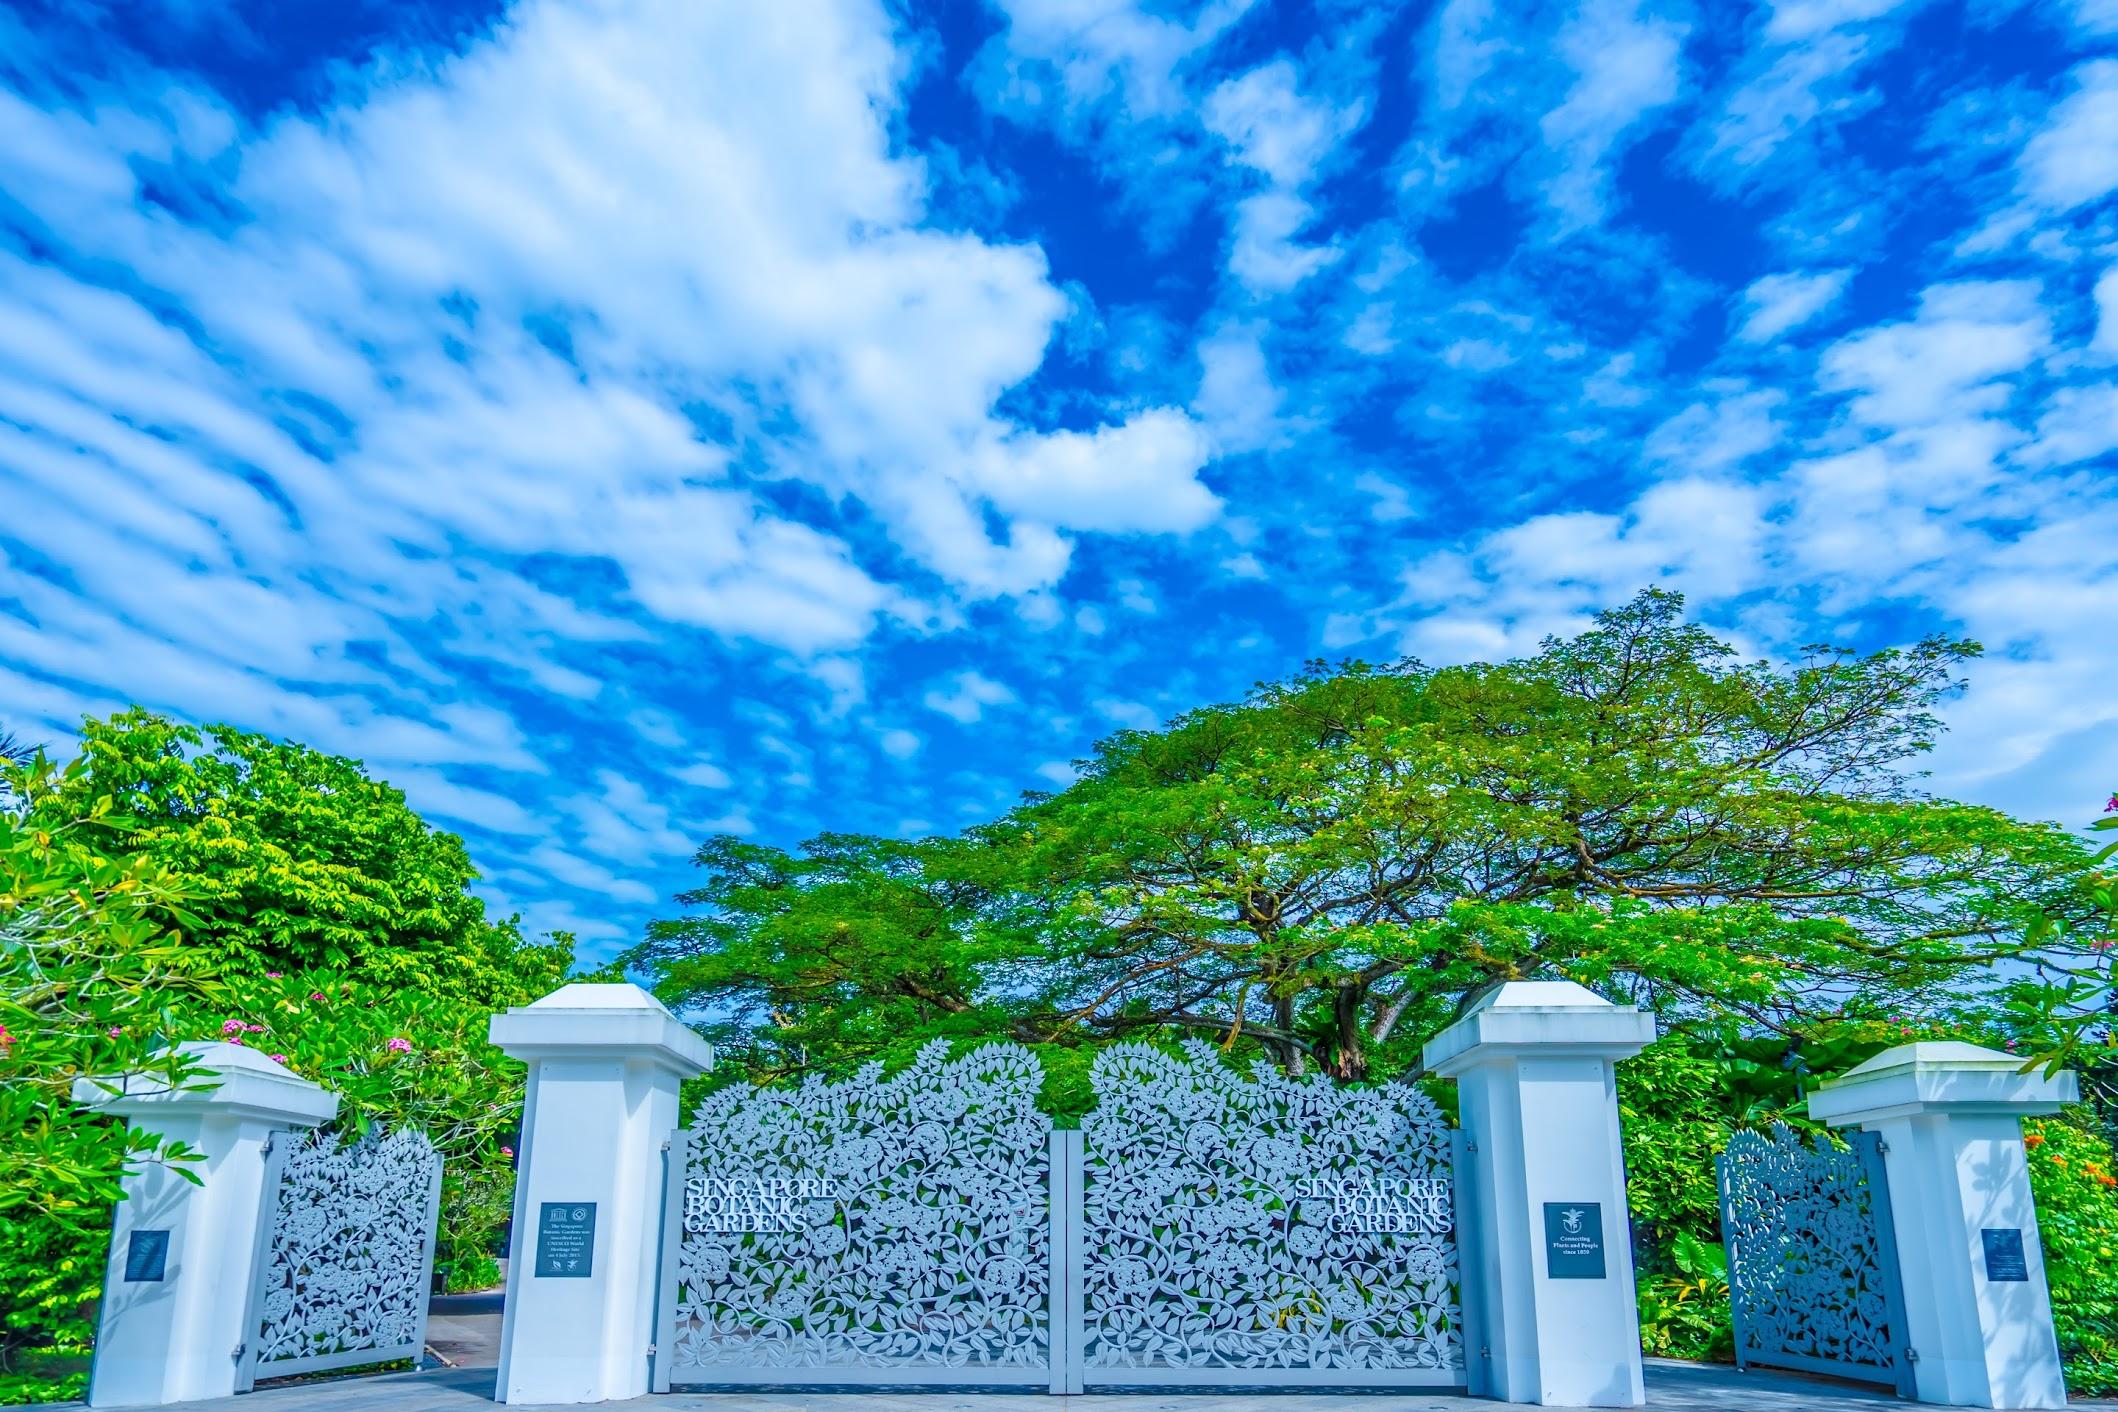 Singapore Botanic Gardens Tanglin Gate1